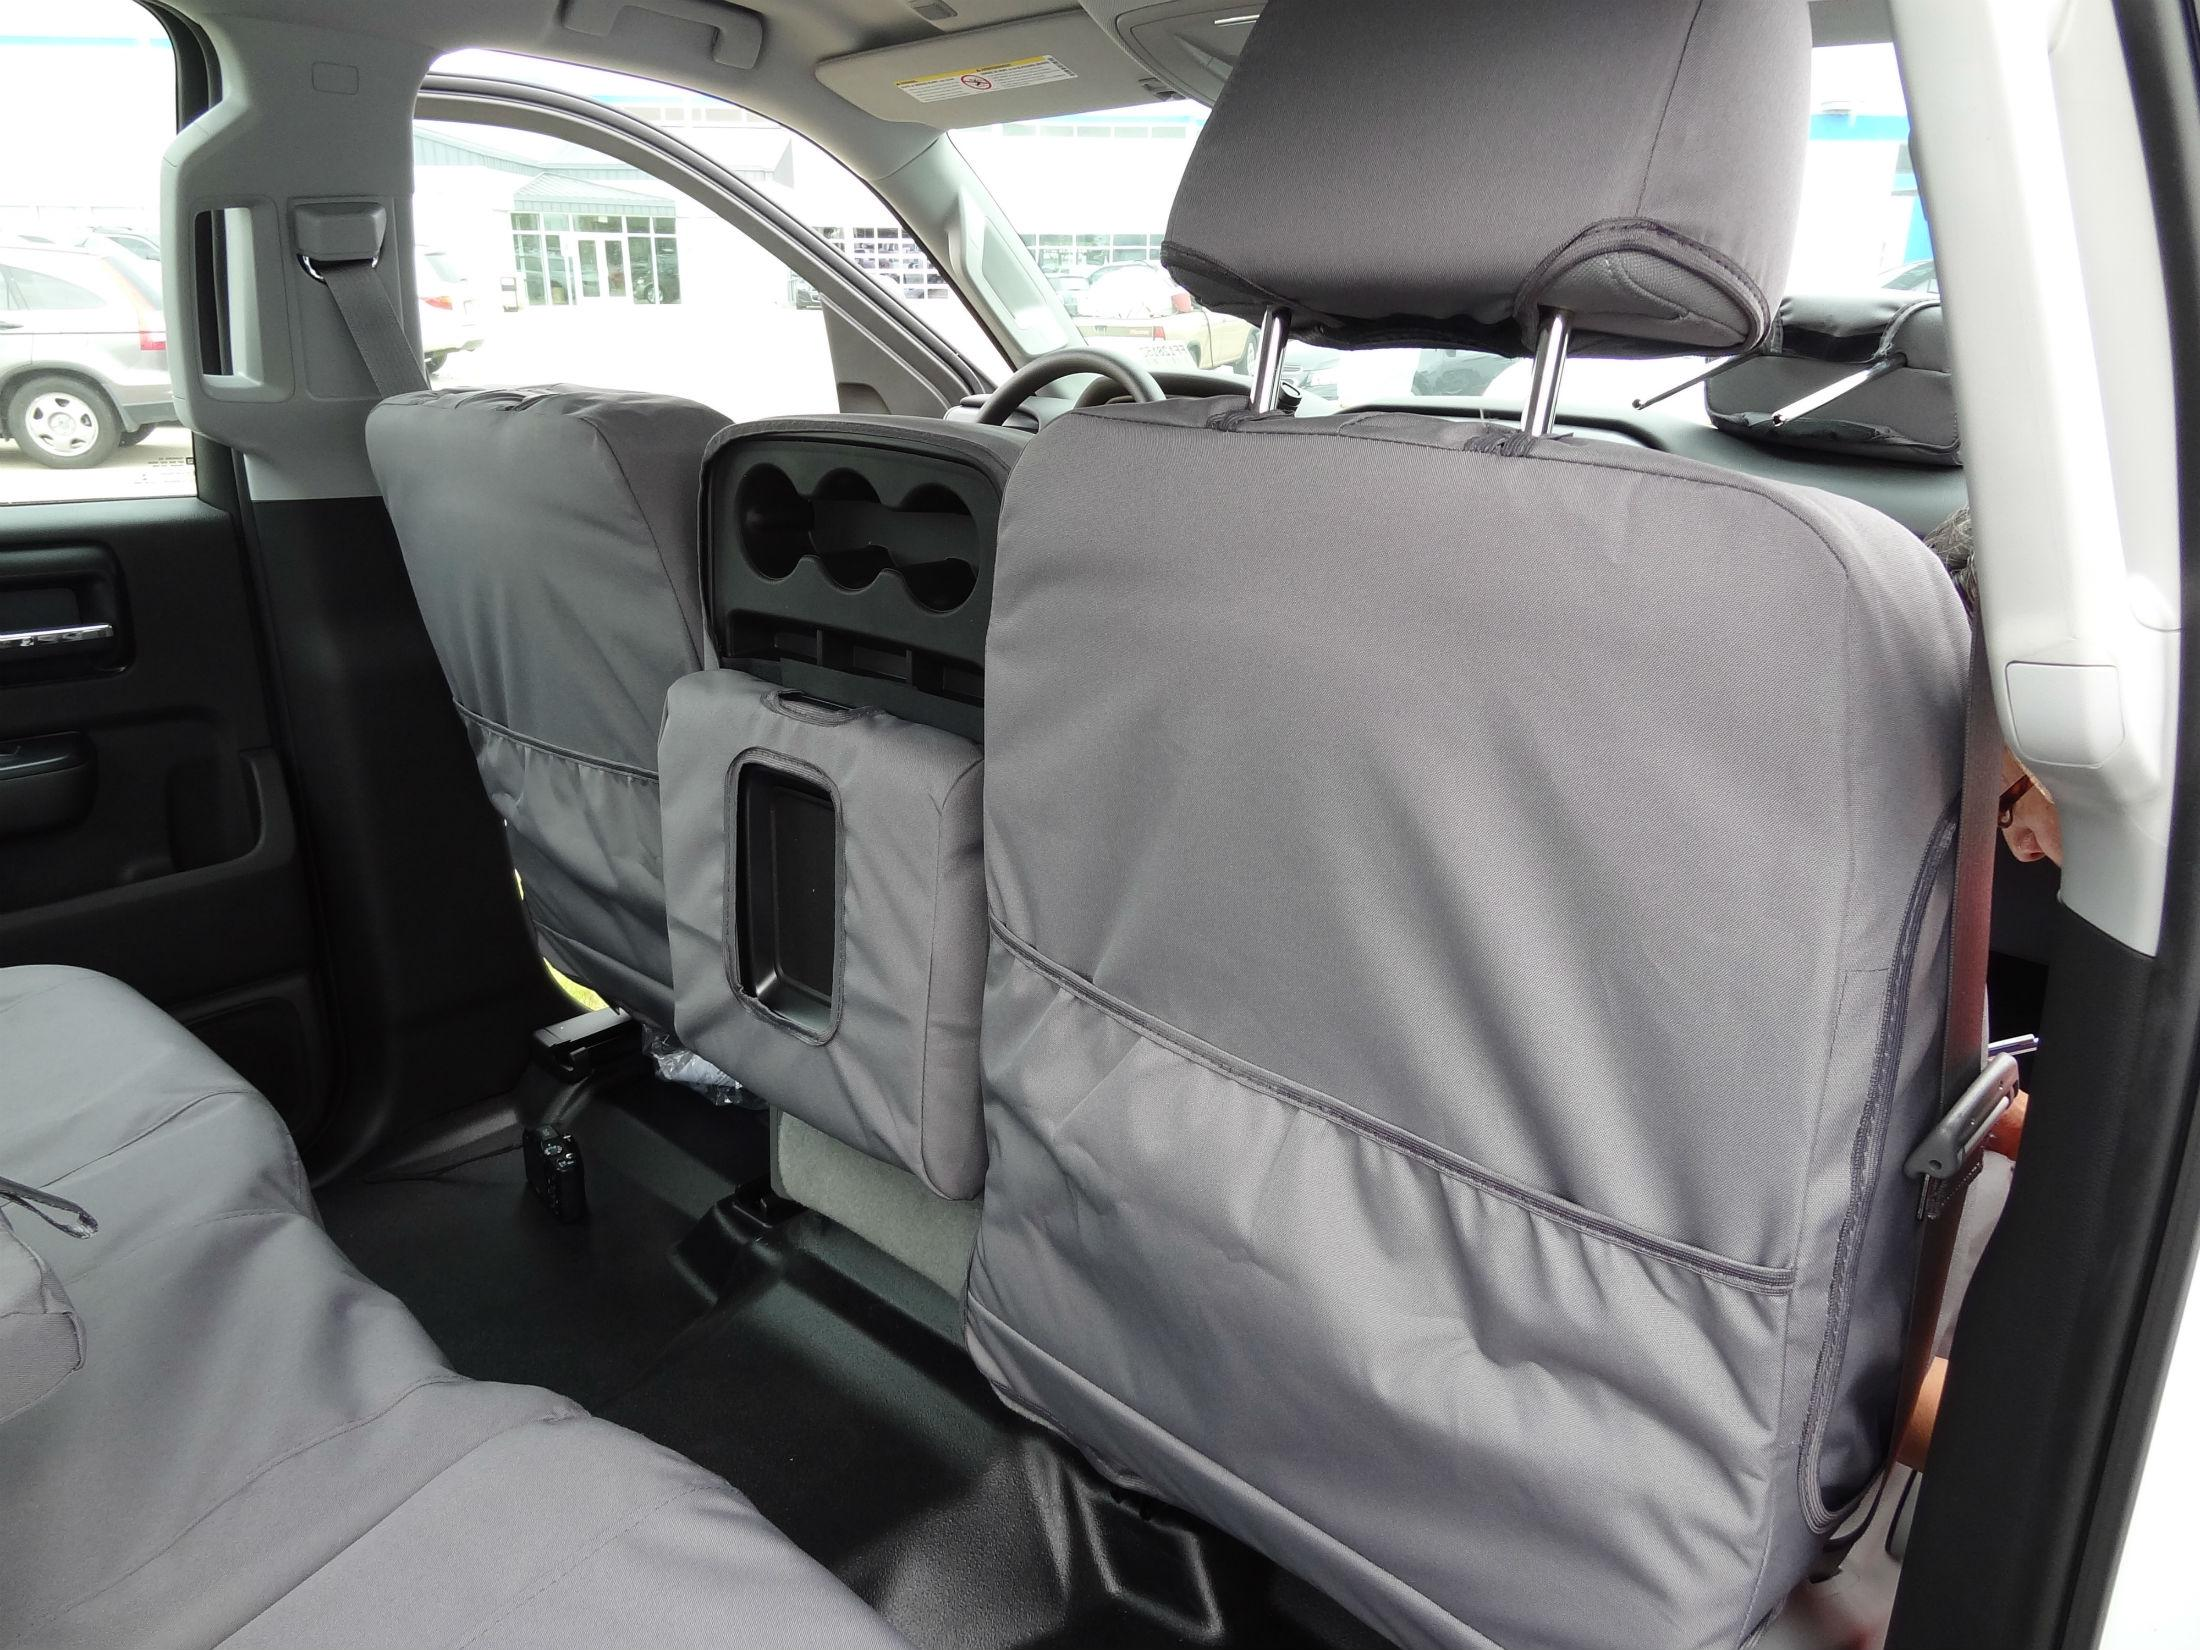 Pleasant 2014 2019 Chevy Silverado Front 40 20 40 Split Bench Seat Machost Co Dining Chair Design Ideas Machostcouk